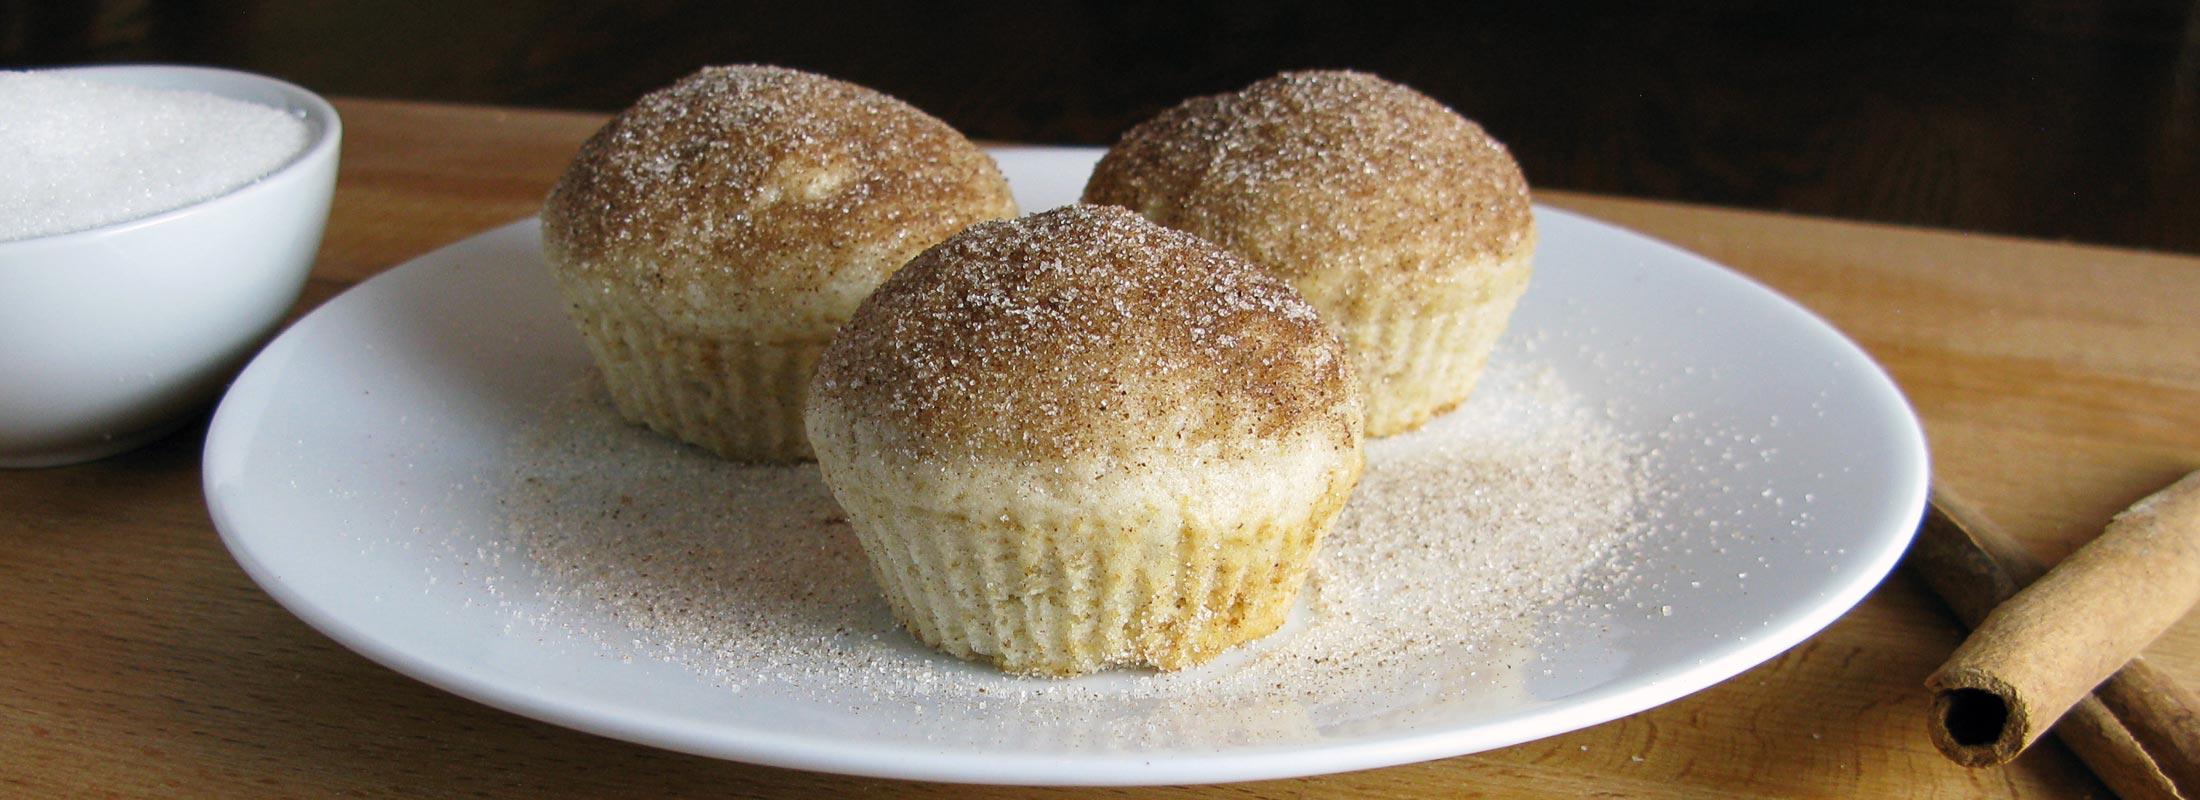 French Breakfast Muffins (Puffs)